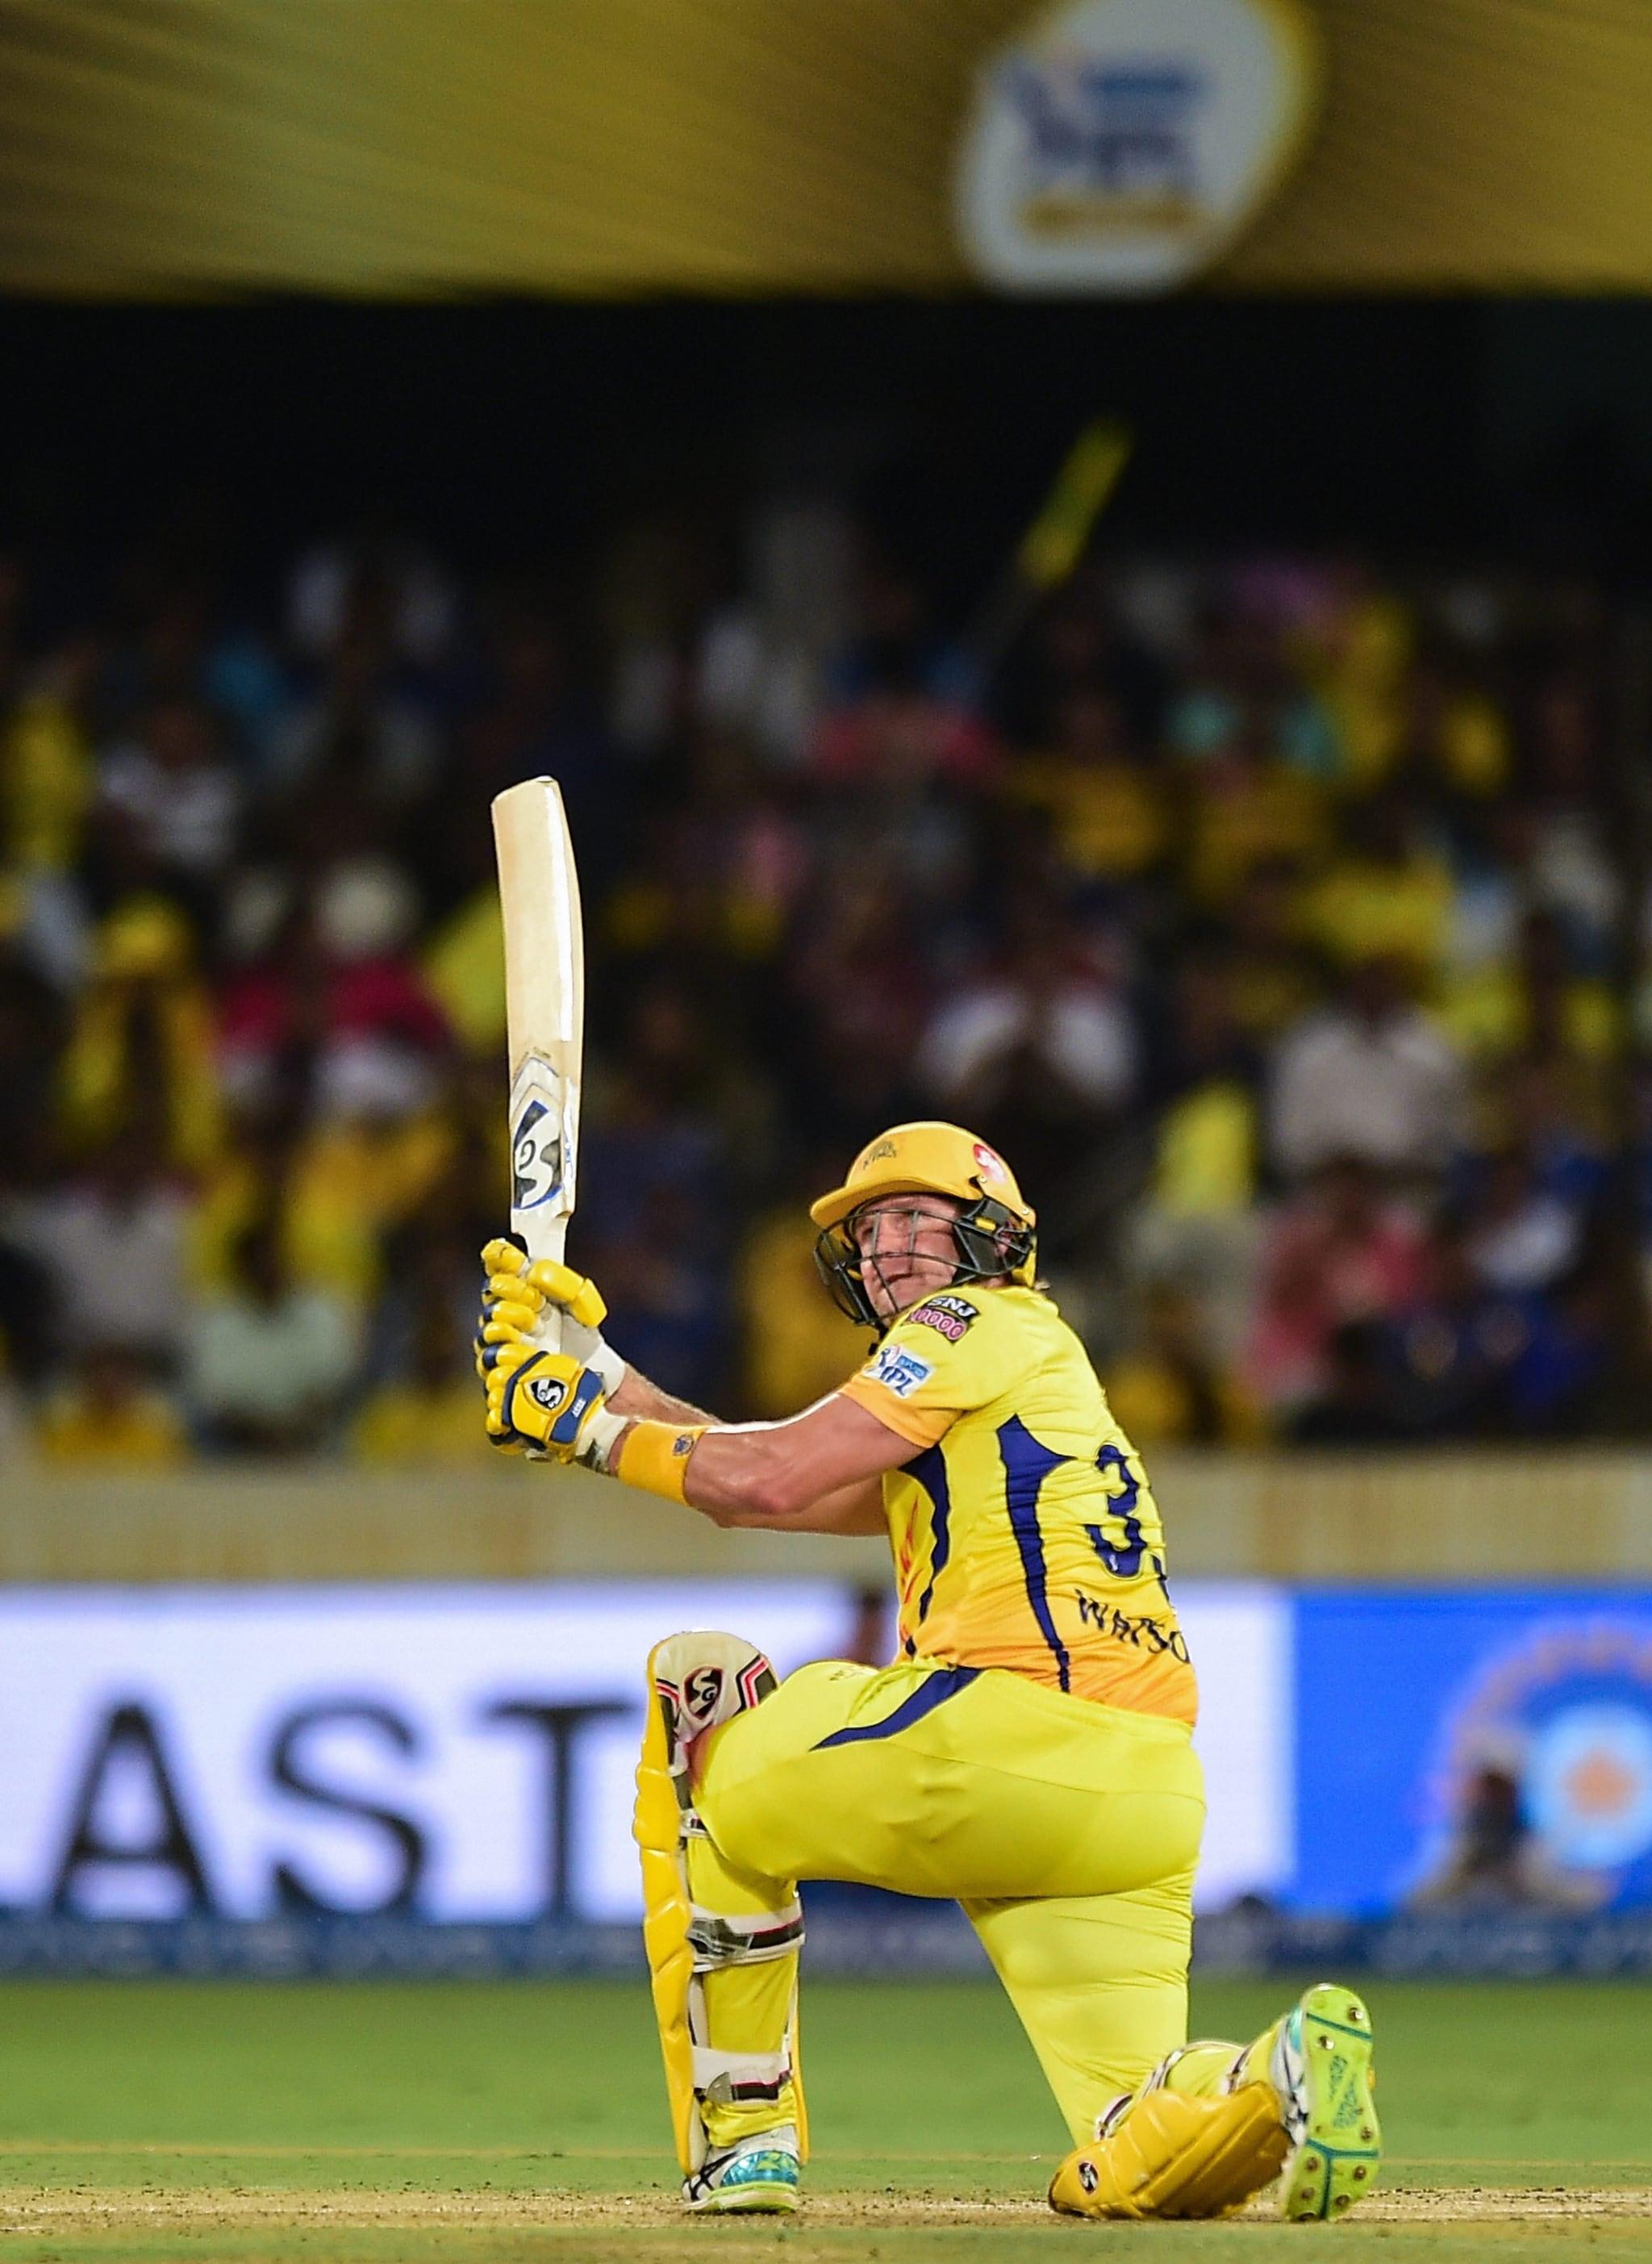 CSK opener Shane Watson plays a shot during the Indian Premier League 2019 final cricket match   PTI